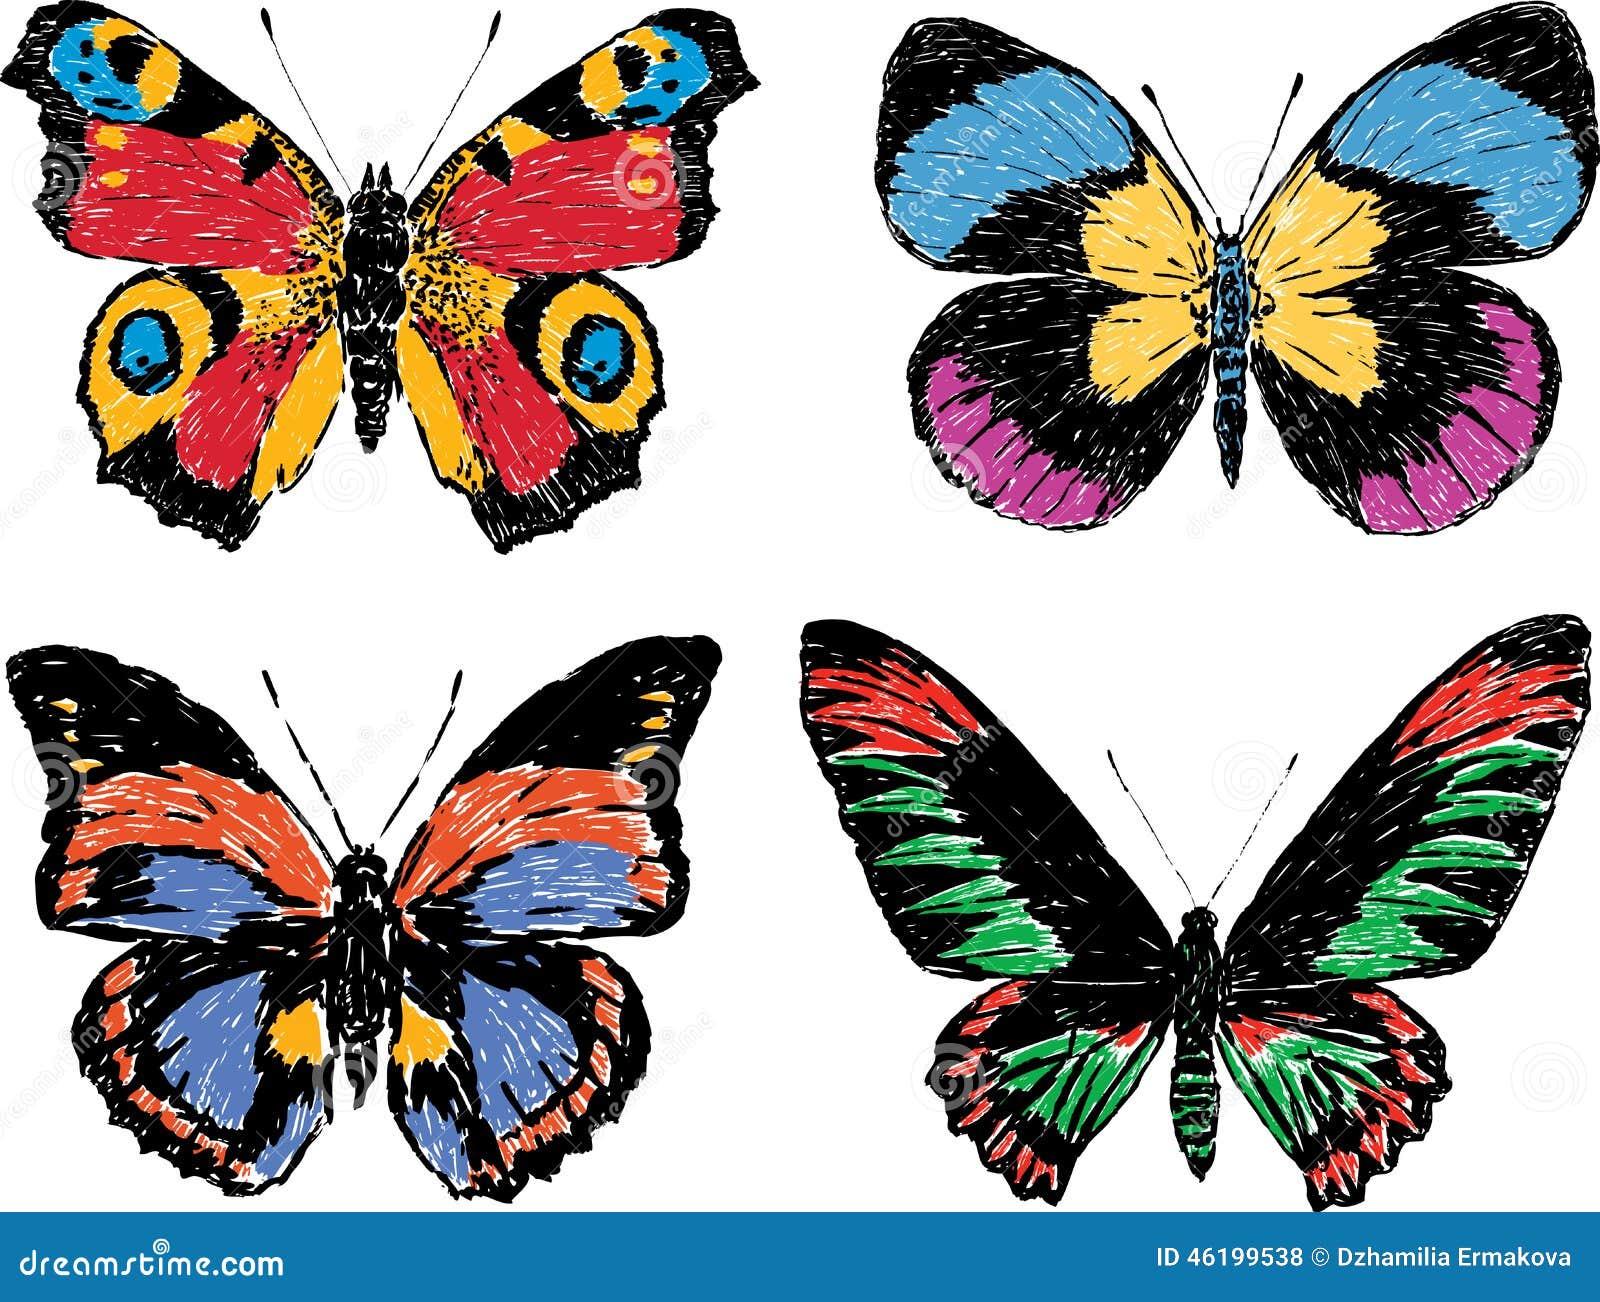 Фото нарисованные бабочки